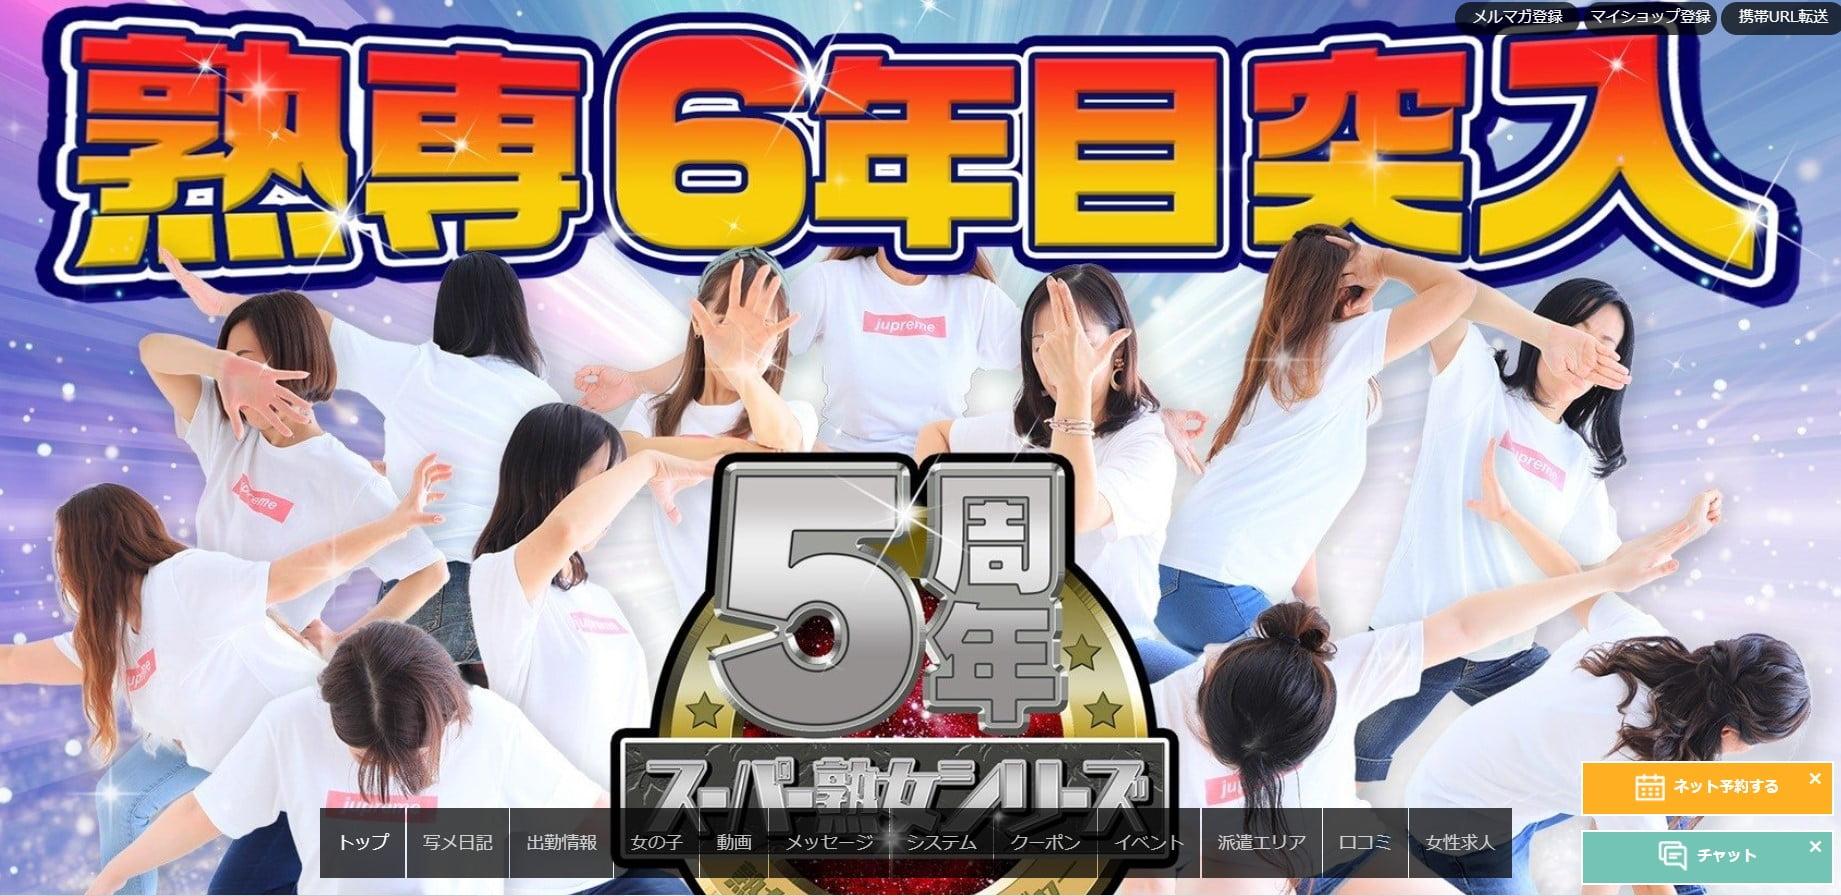 熟専40'S 50'S沖縄店